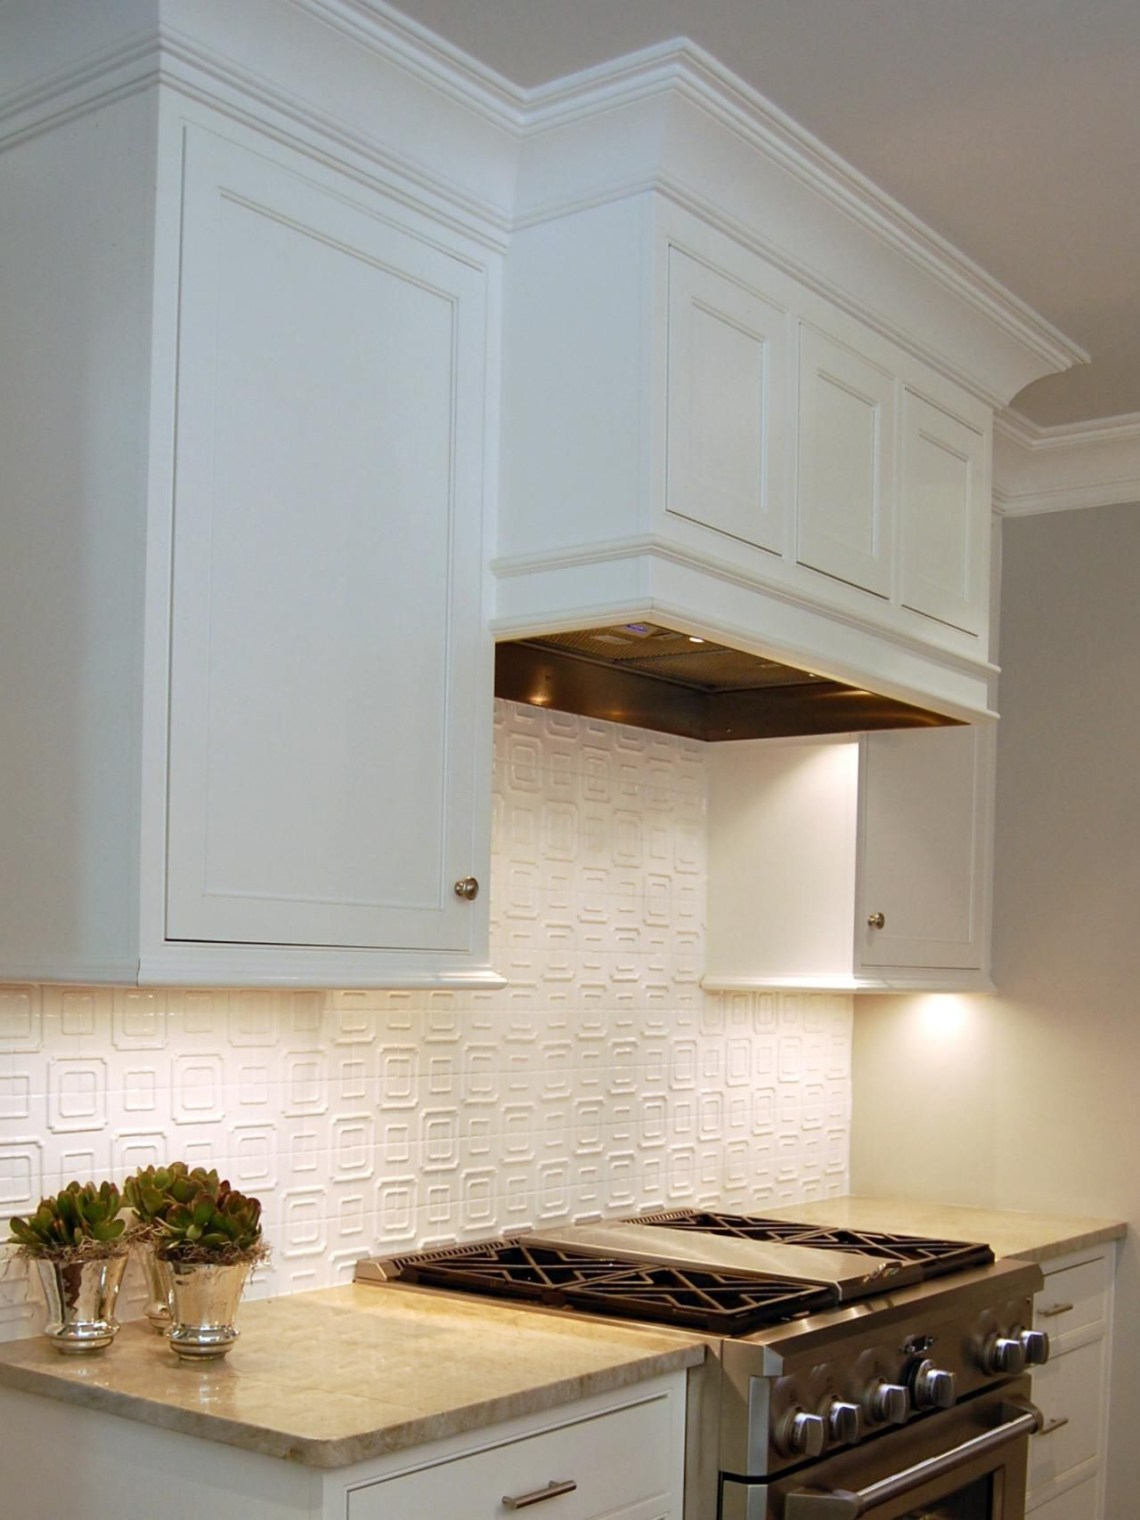 The Hidden Range Hood Helps The Open Kitchen Blend Easily